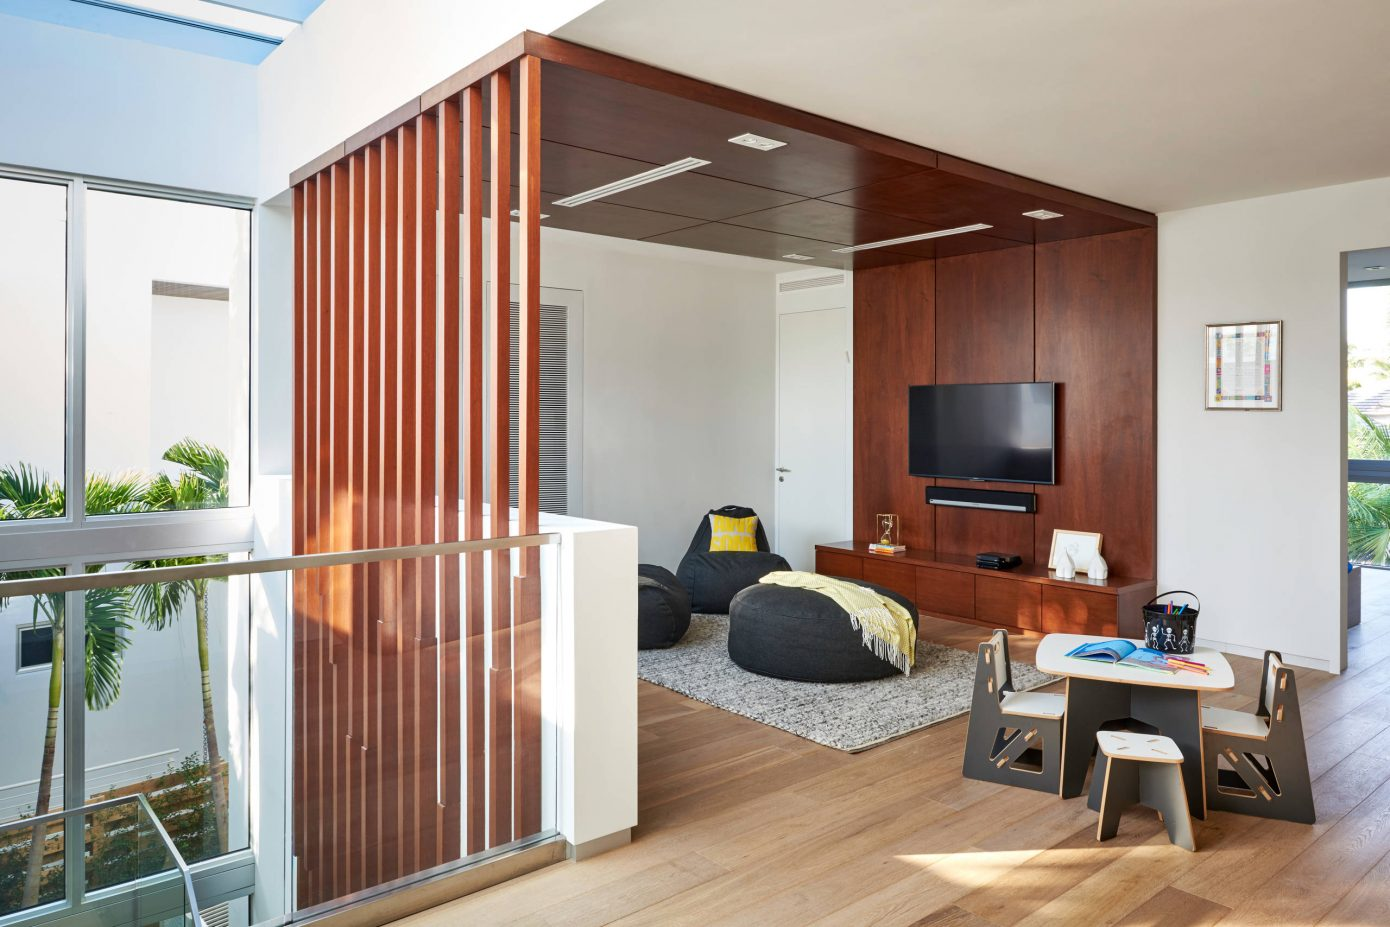 Miami Splendor - Amazing Two-story Family House - the tv room-2